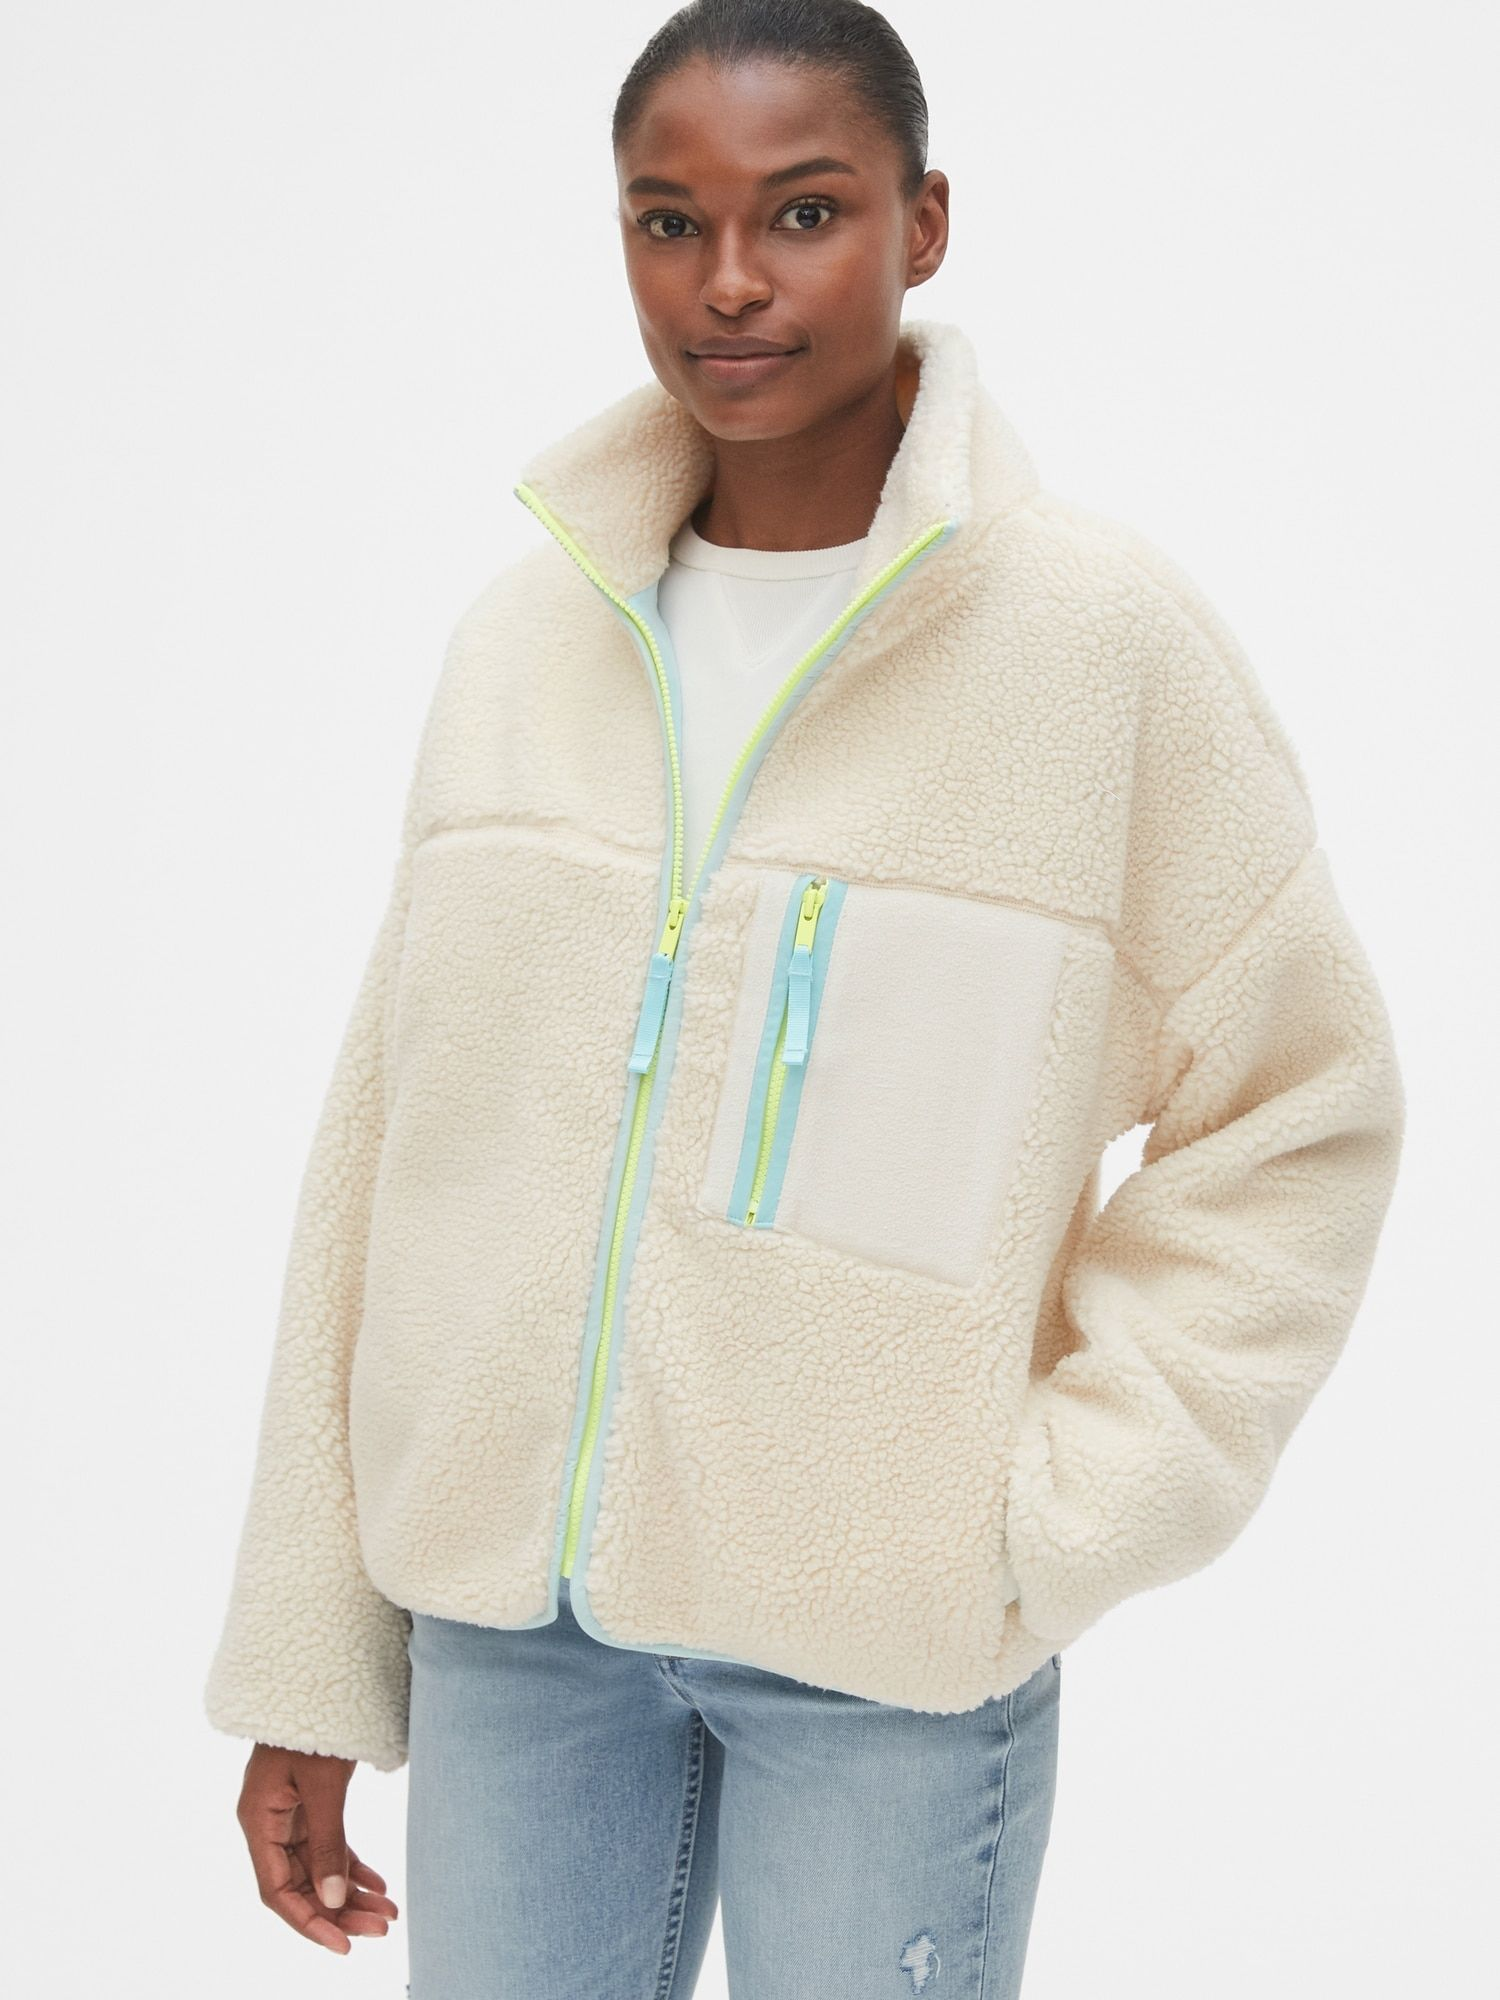 Gap Sherpa Full Zip Jacket Off White In 2021 Coats Jackets Women Jackets Zip Jackets [ 2000 x 1500 Pixel ]